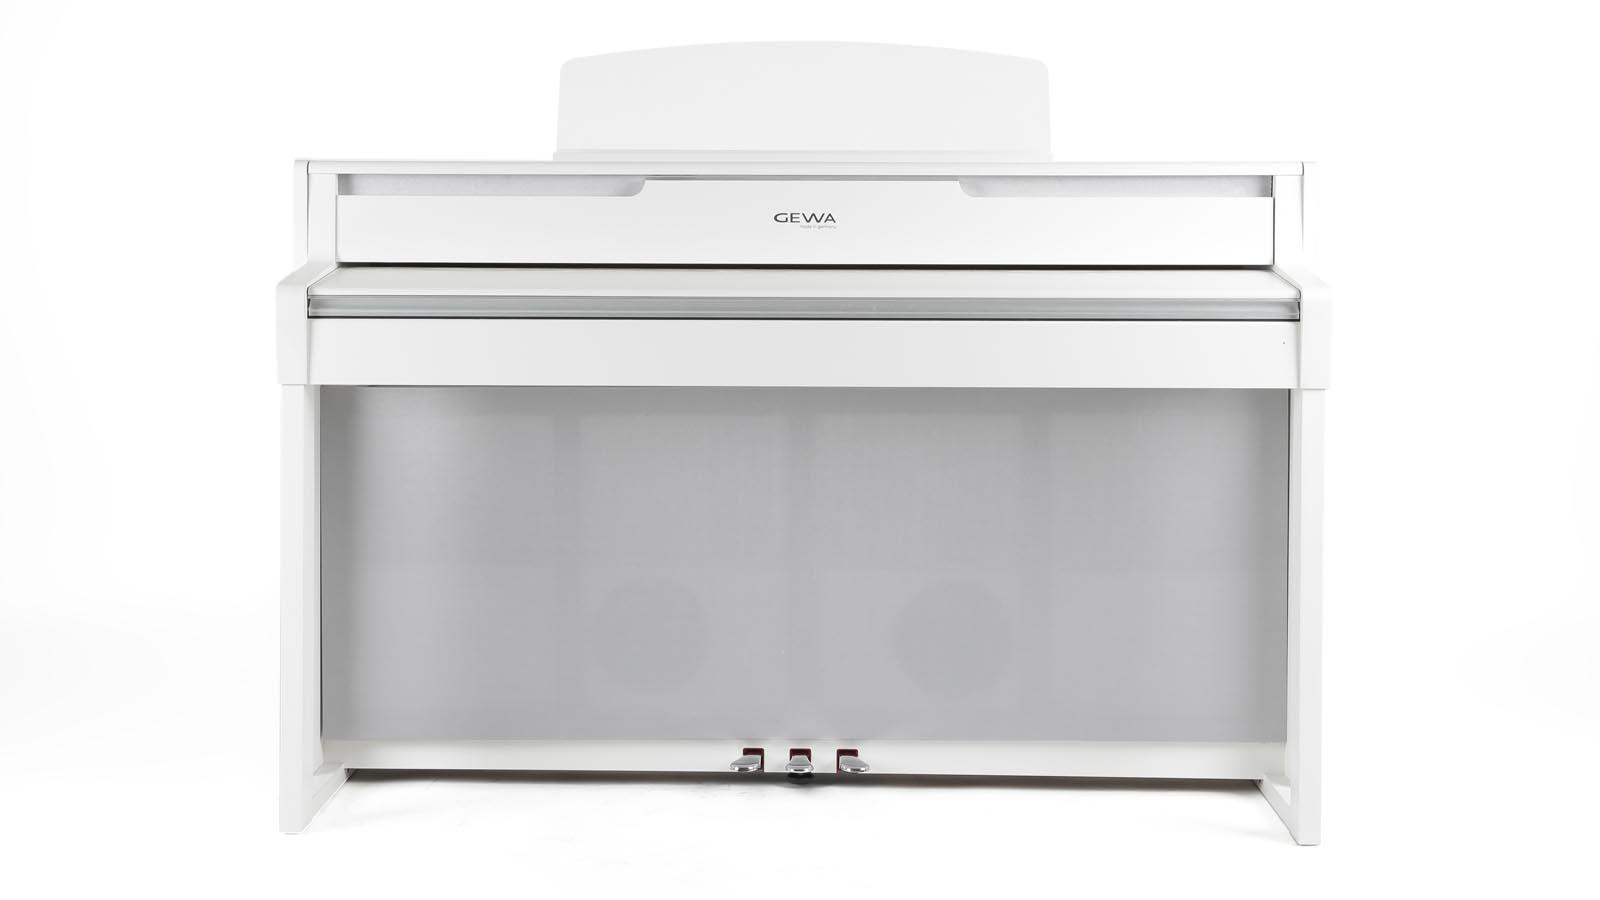 Gewa UP400 WH Digital-Piano weiß matt